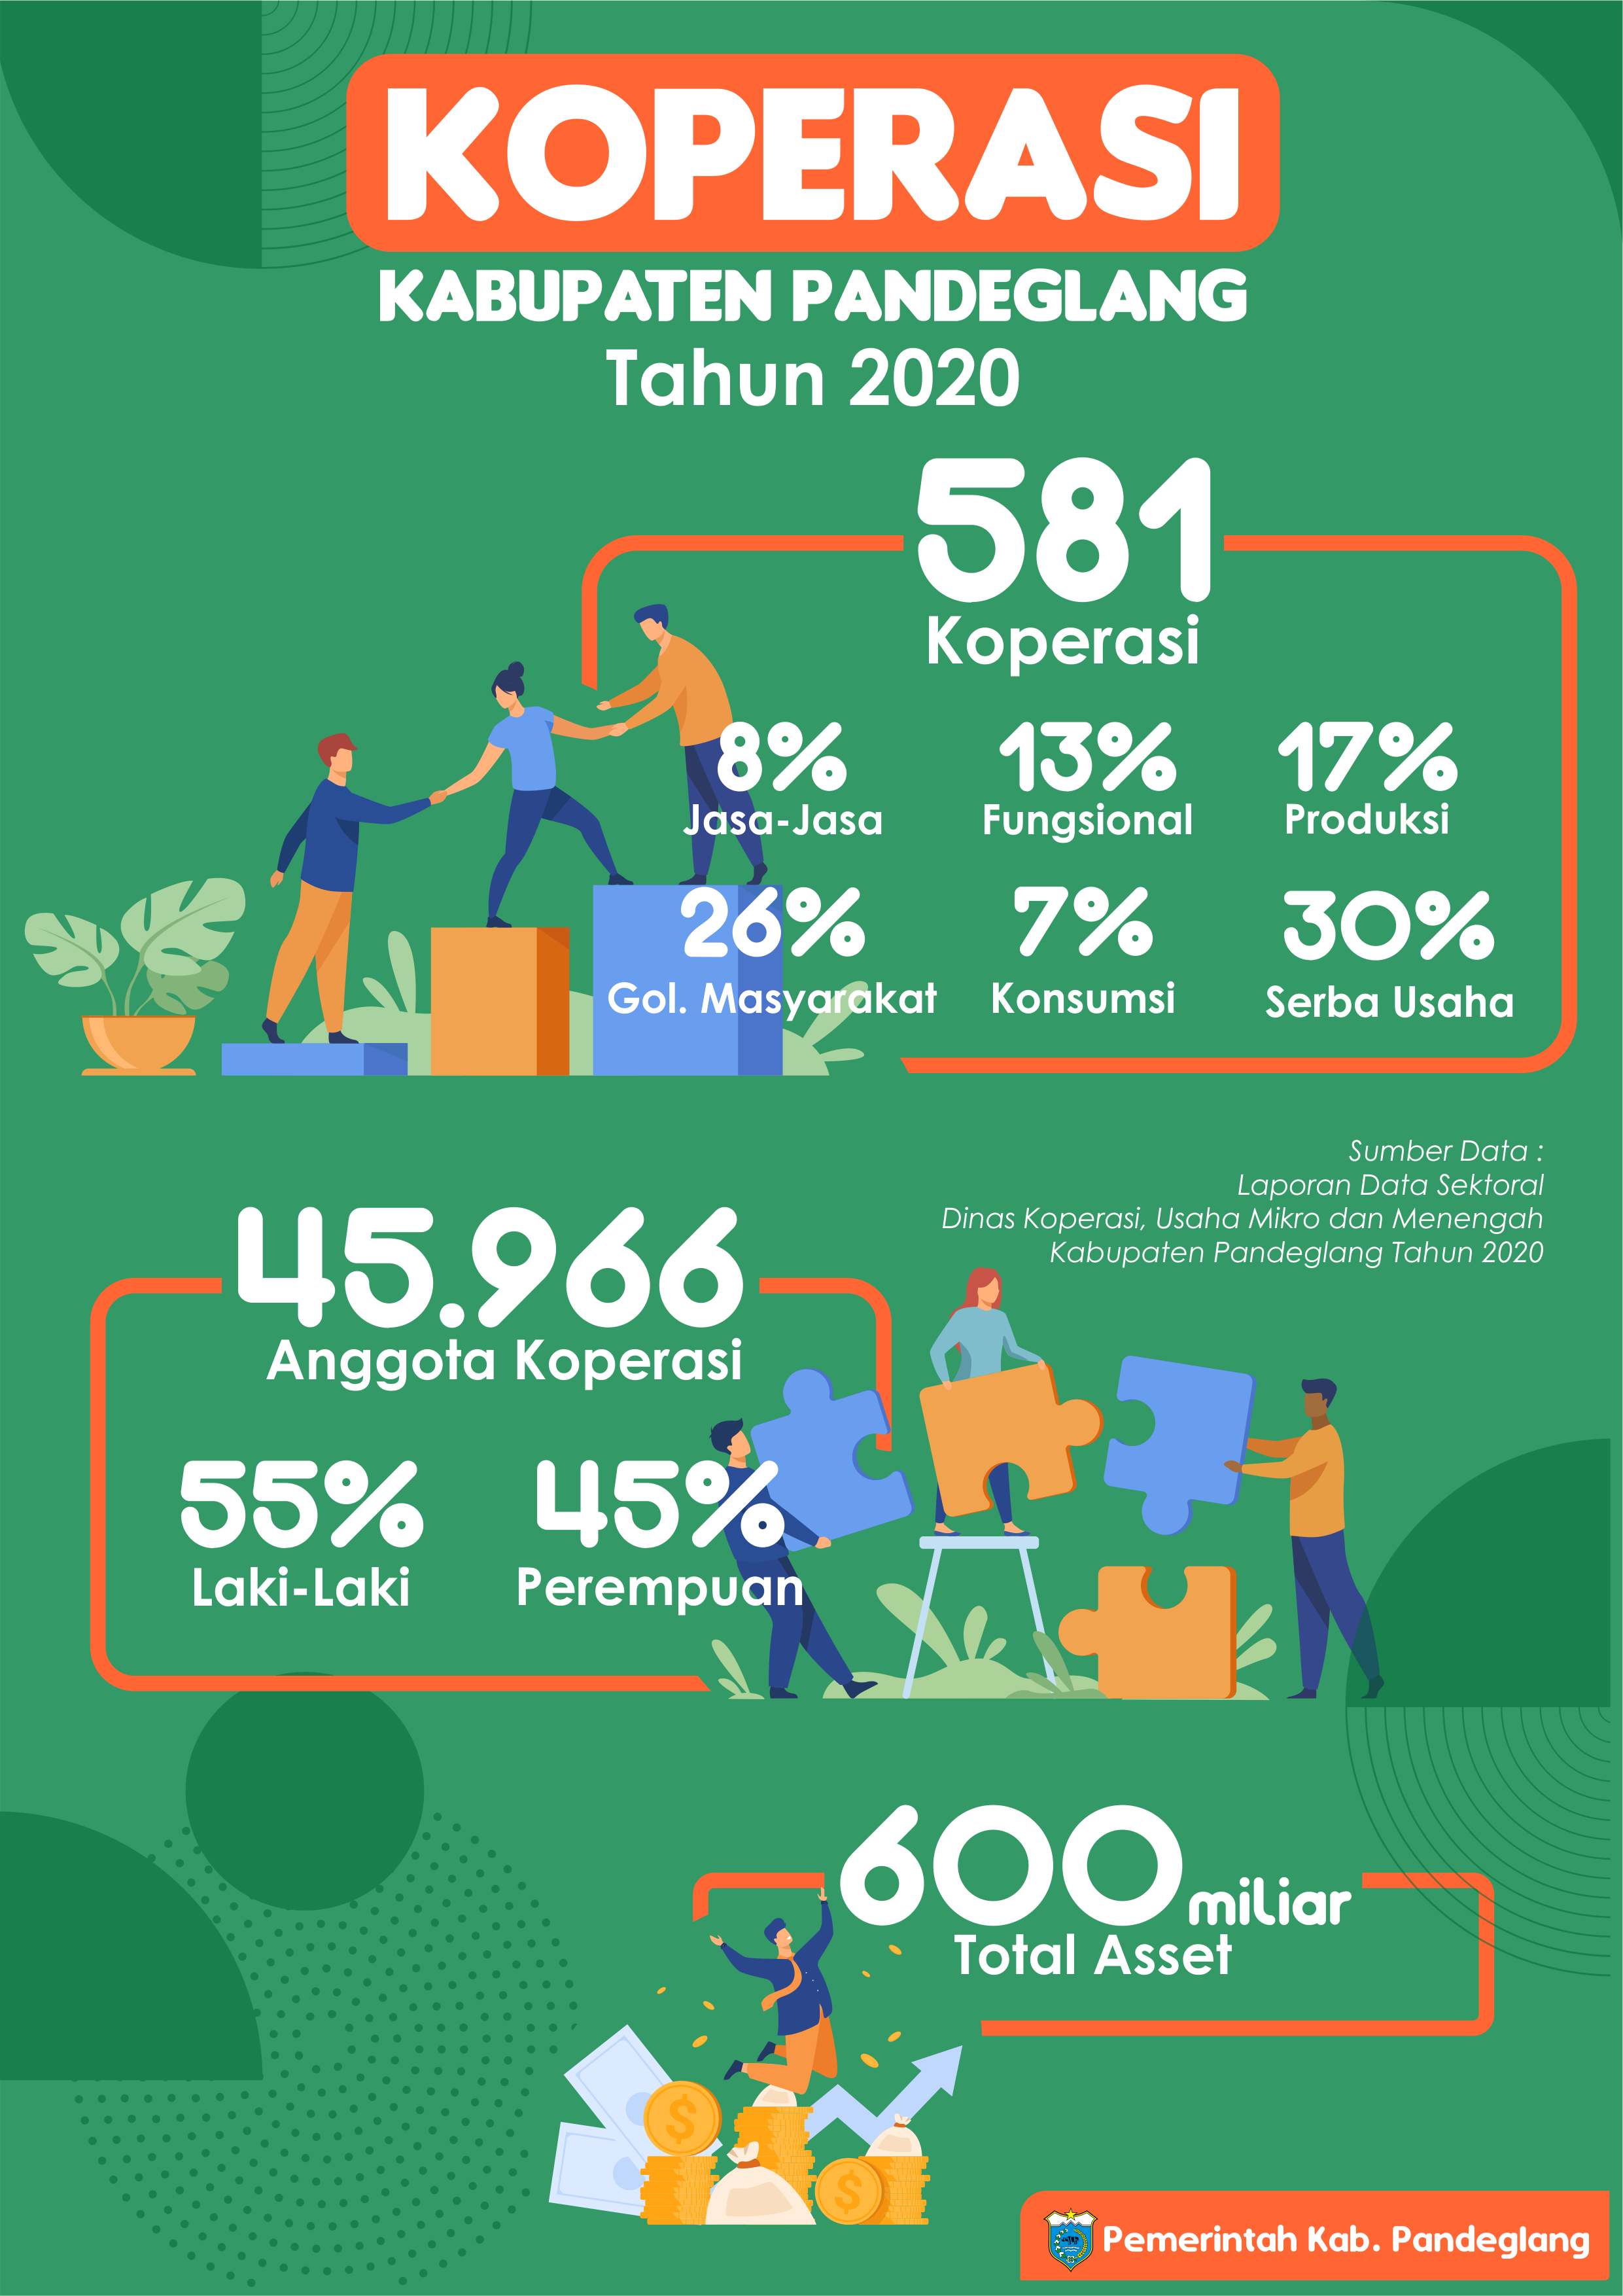 Koperasi Kabupaten Pandeglang Tahun 2020